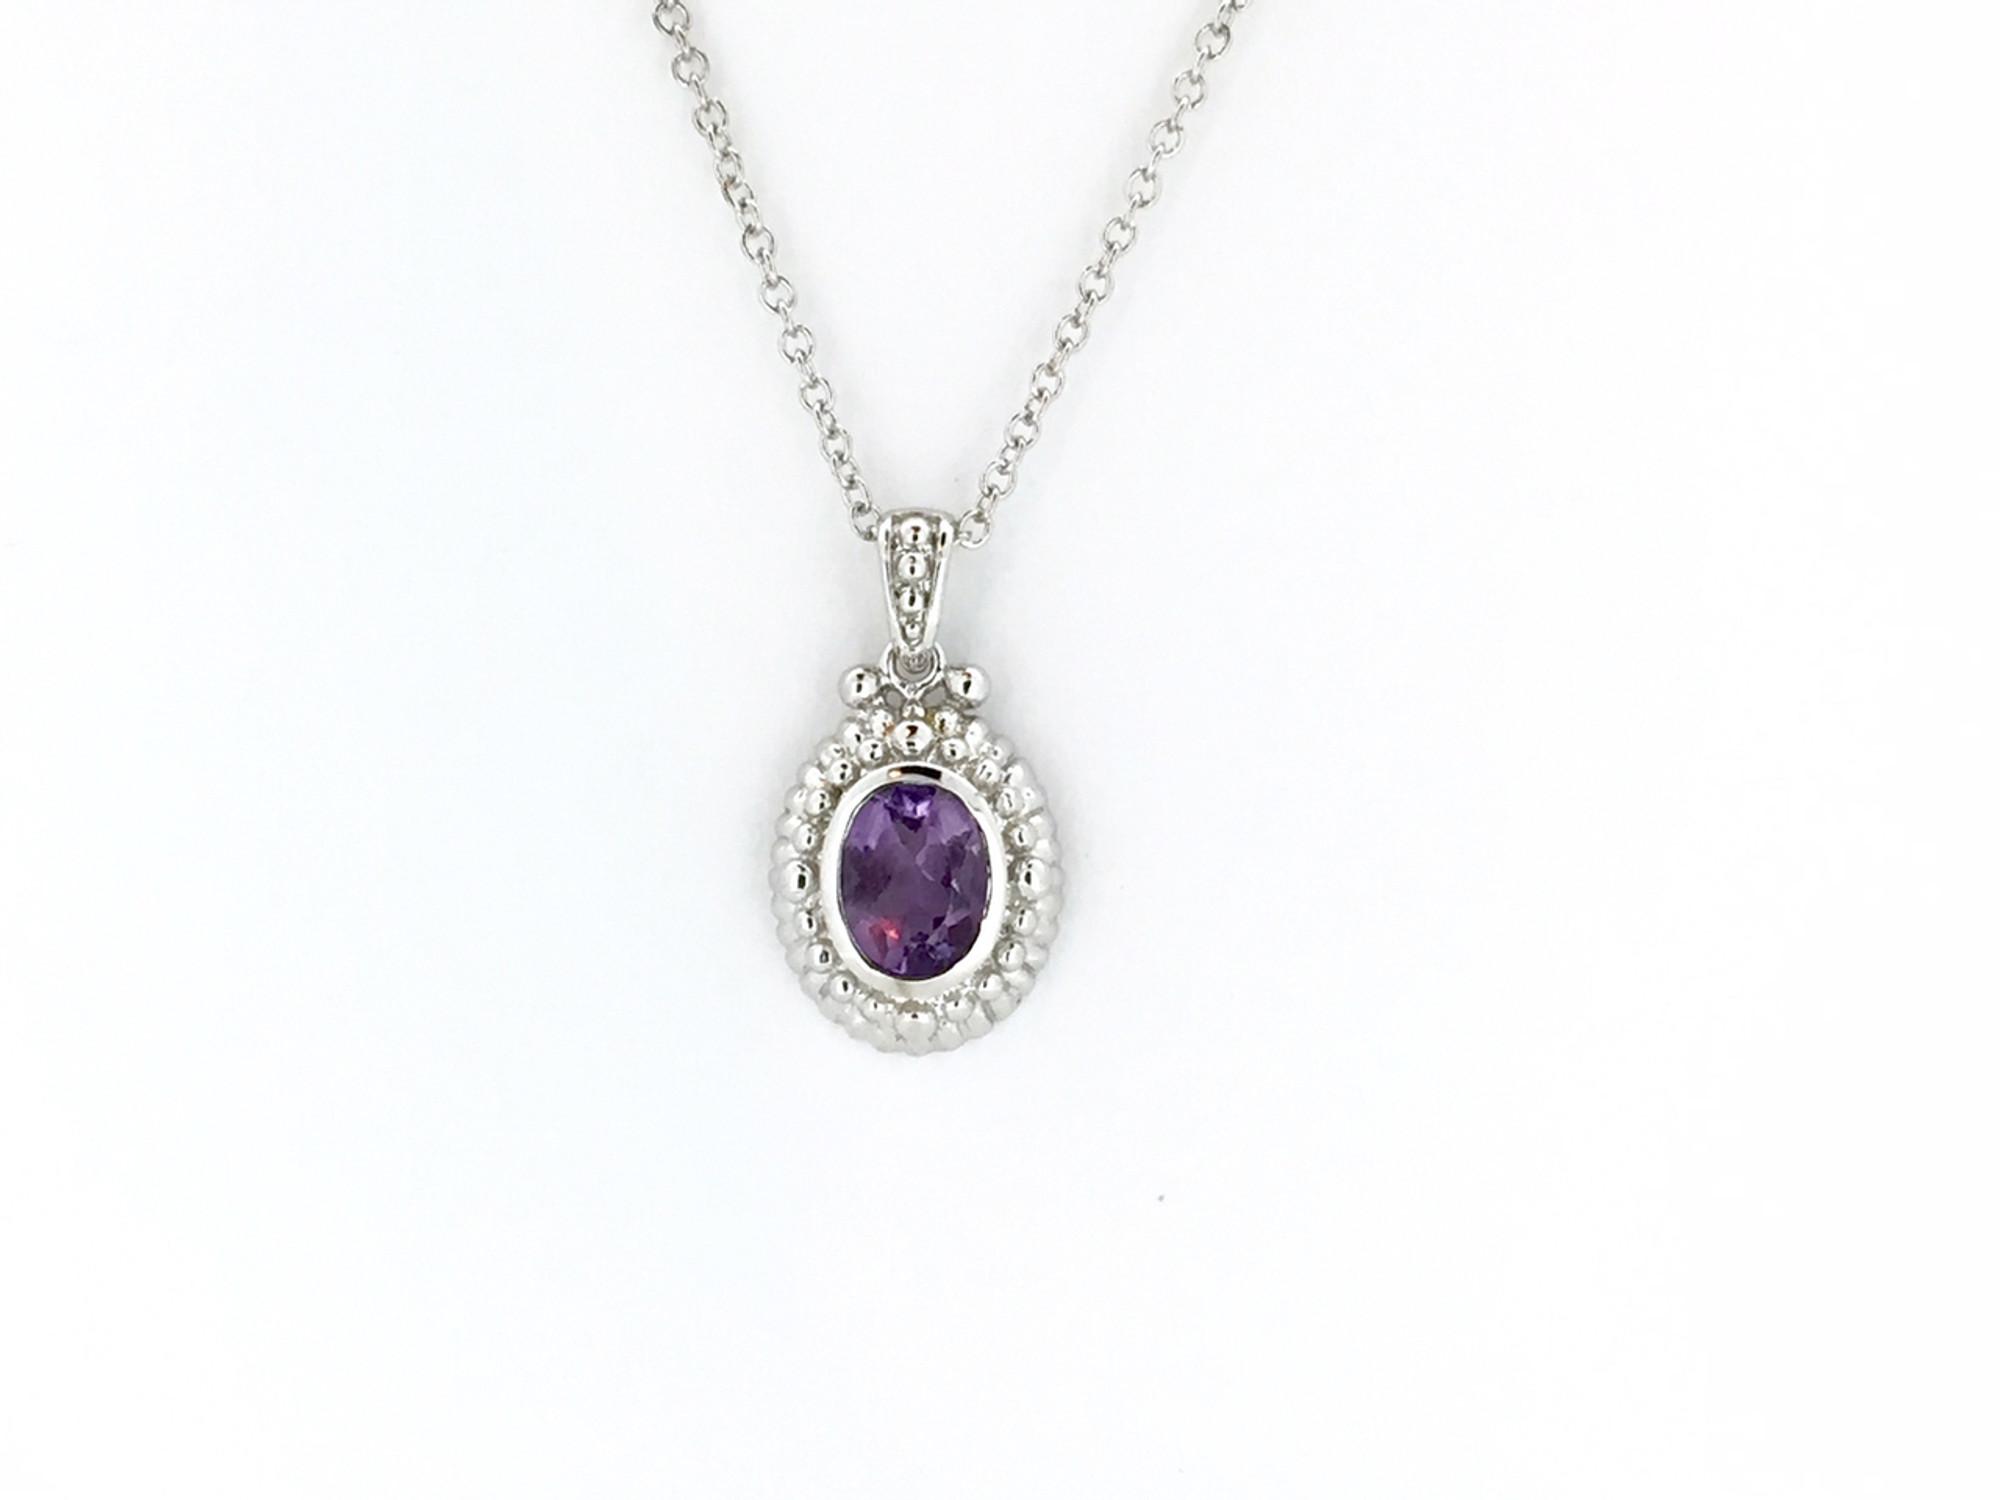 ebf006a0a Sterling Silver/Amethyst Oval Necklace - Mima's Of Warwick, LLC